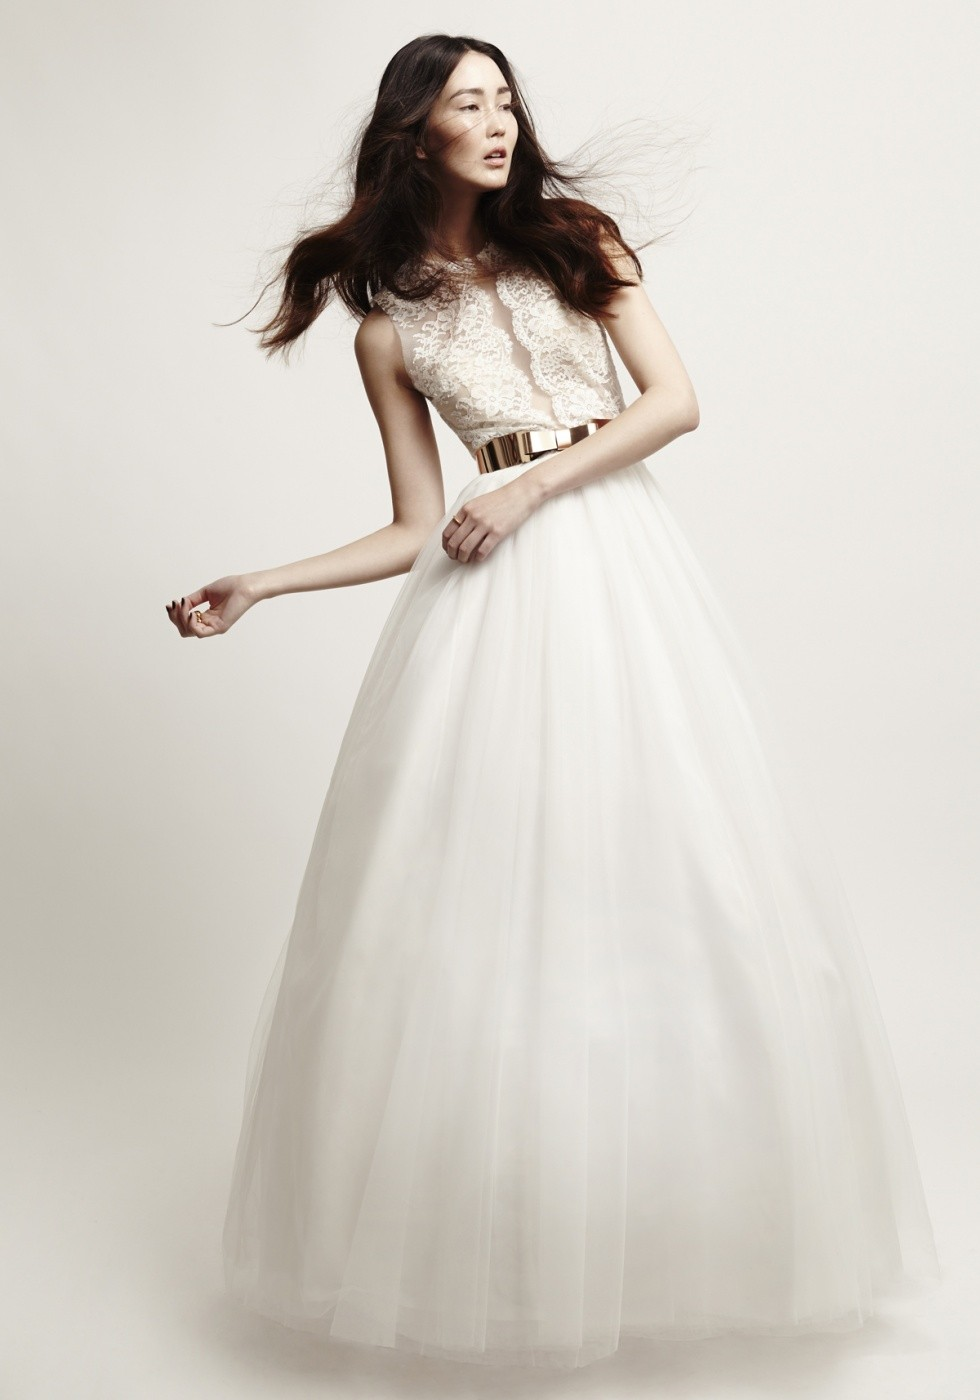 kg_Petite Fleur Dress_2_jpg